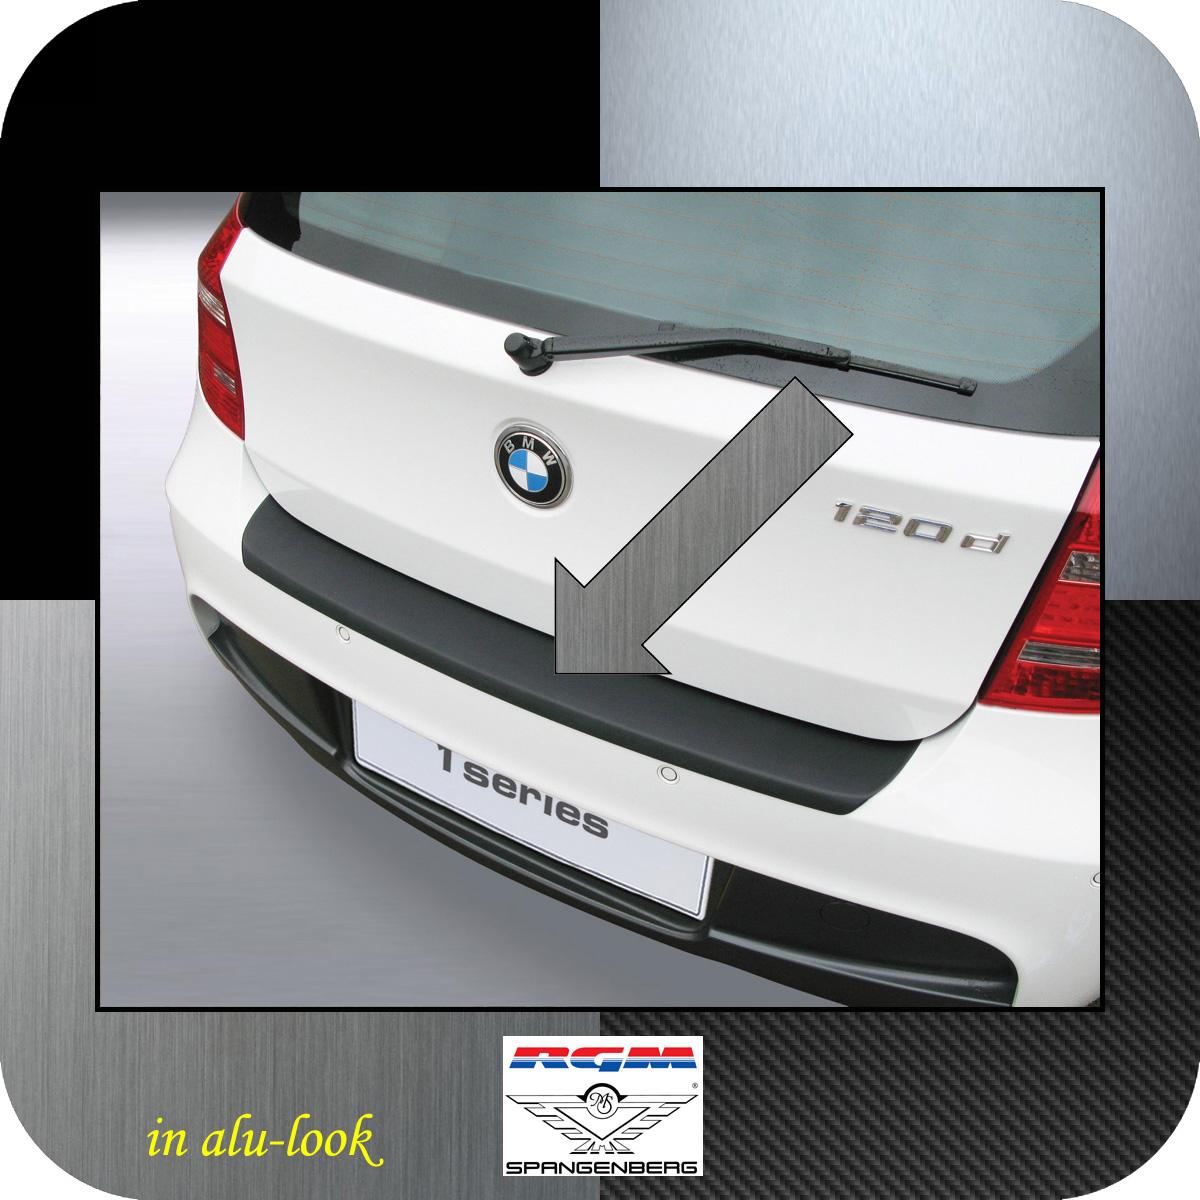 Ladekantenschutz Alu-Look BMW 1er E81 E87 M-Style ab facelift 2007-12 3504457